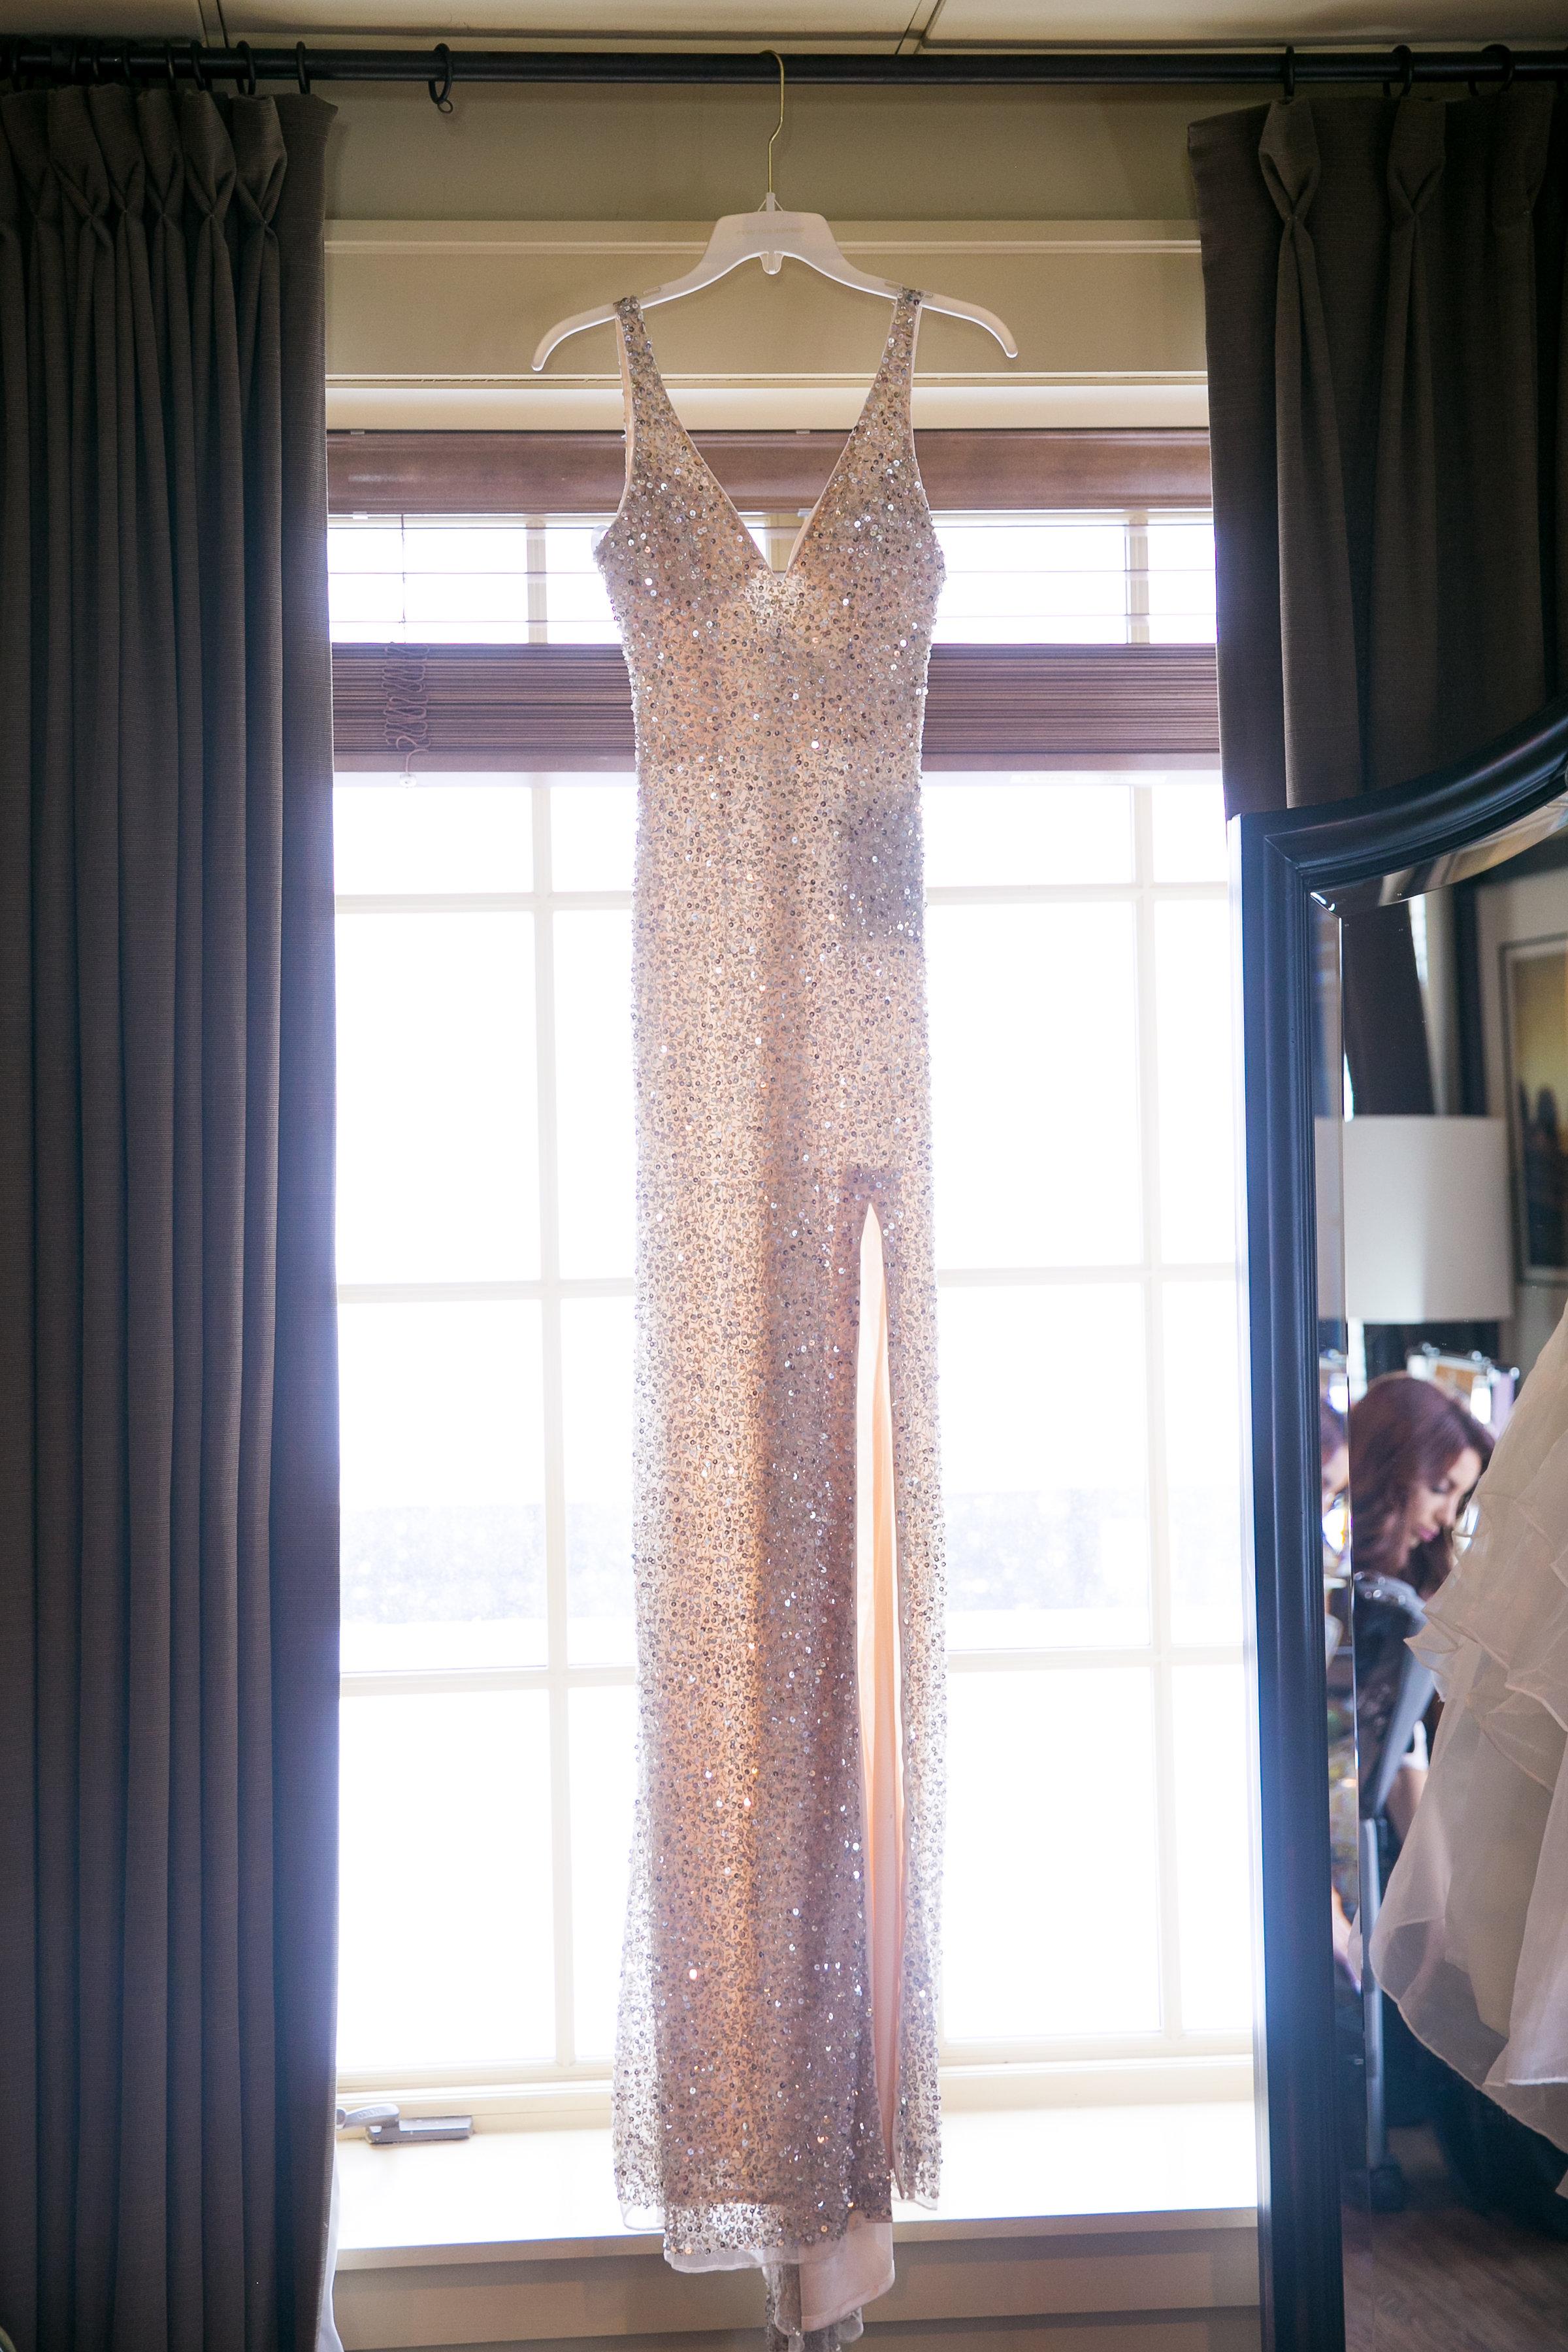 Dresses by Mac Duggal